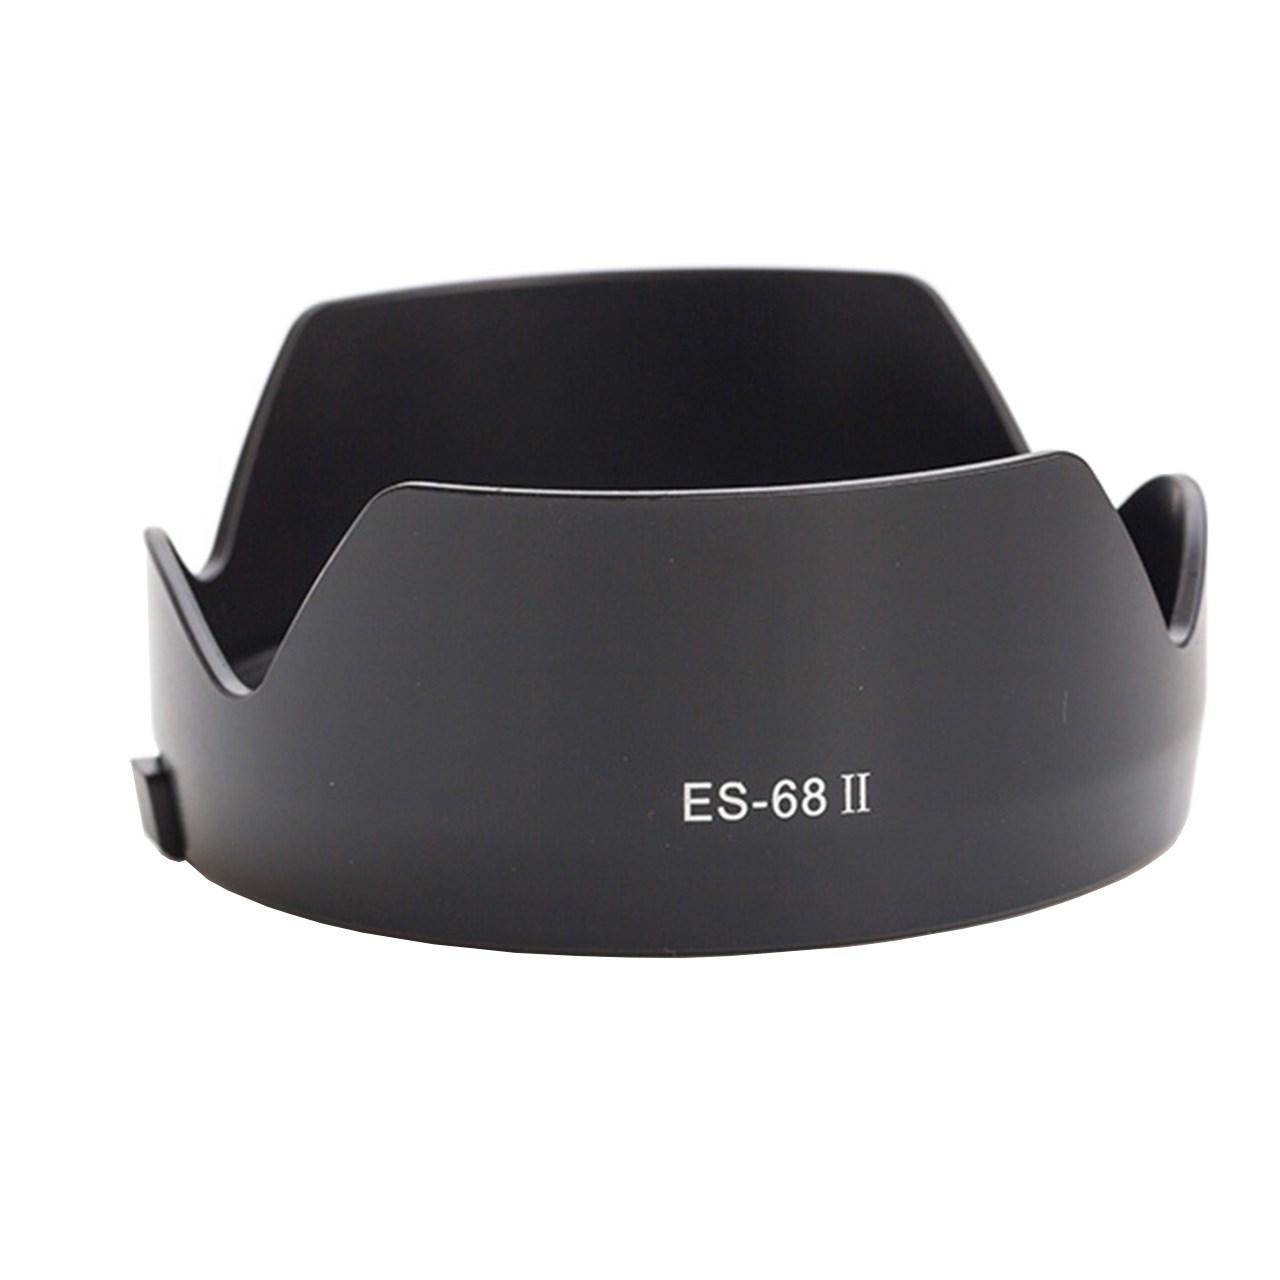 هود لنز مدل ES-68II